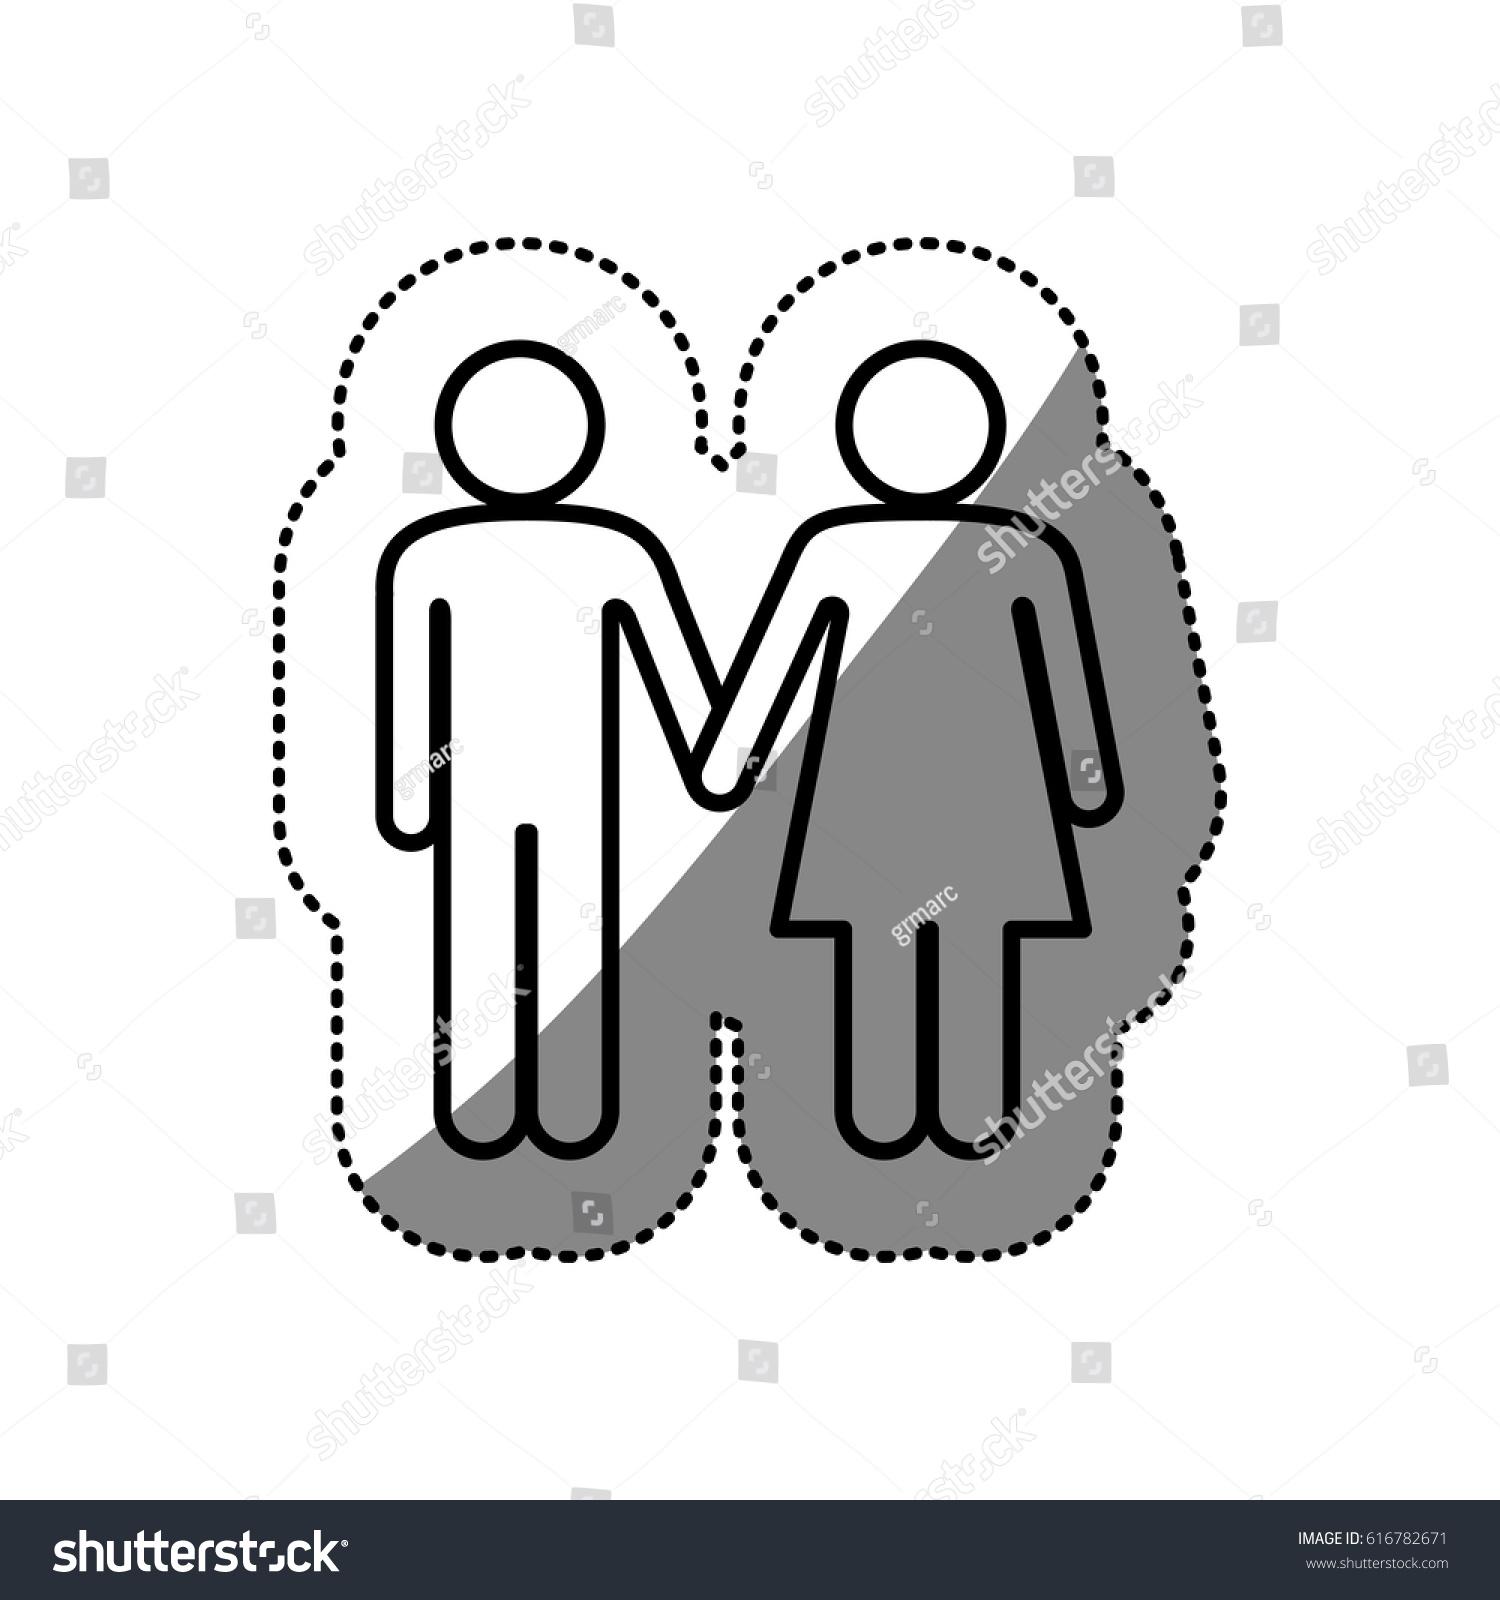 Sticker Silhouette Pictogram Silhouette Couple Holding Stock ... for Couple Sticker Line  34eri